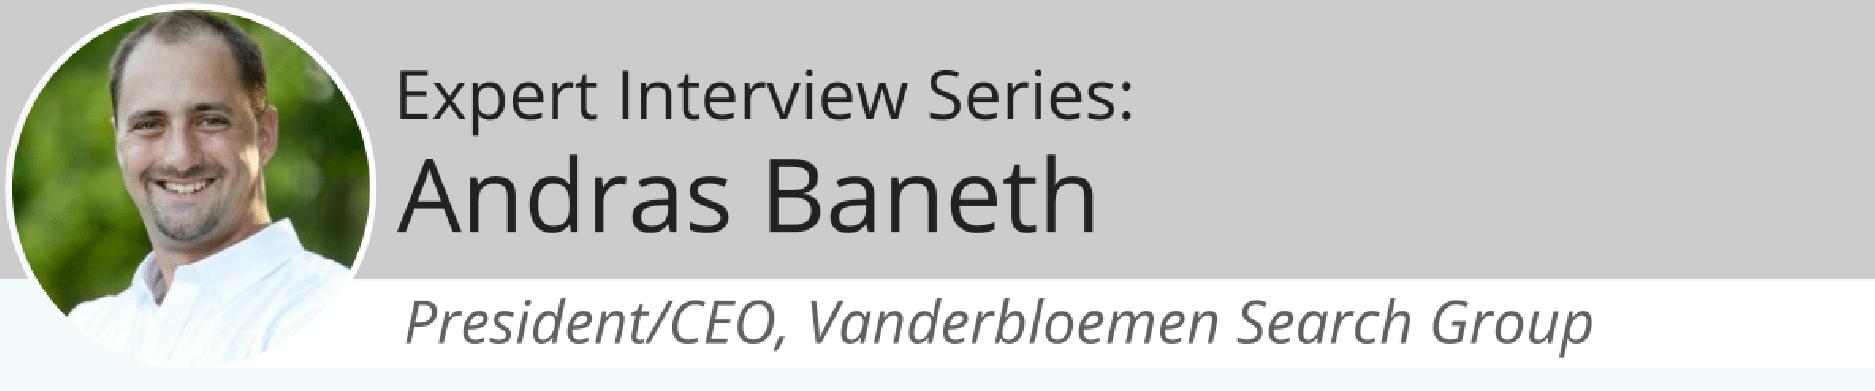 Andras Baneth